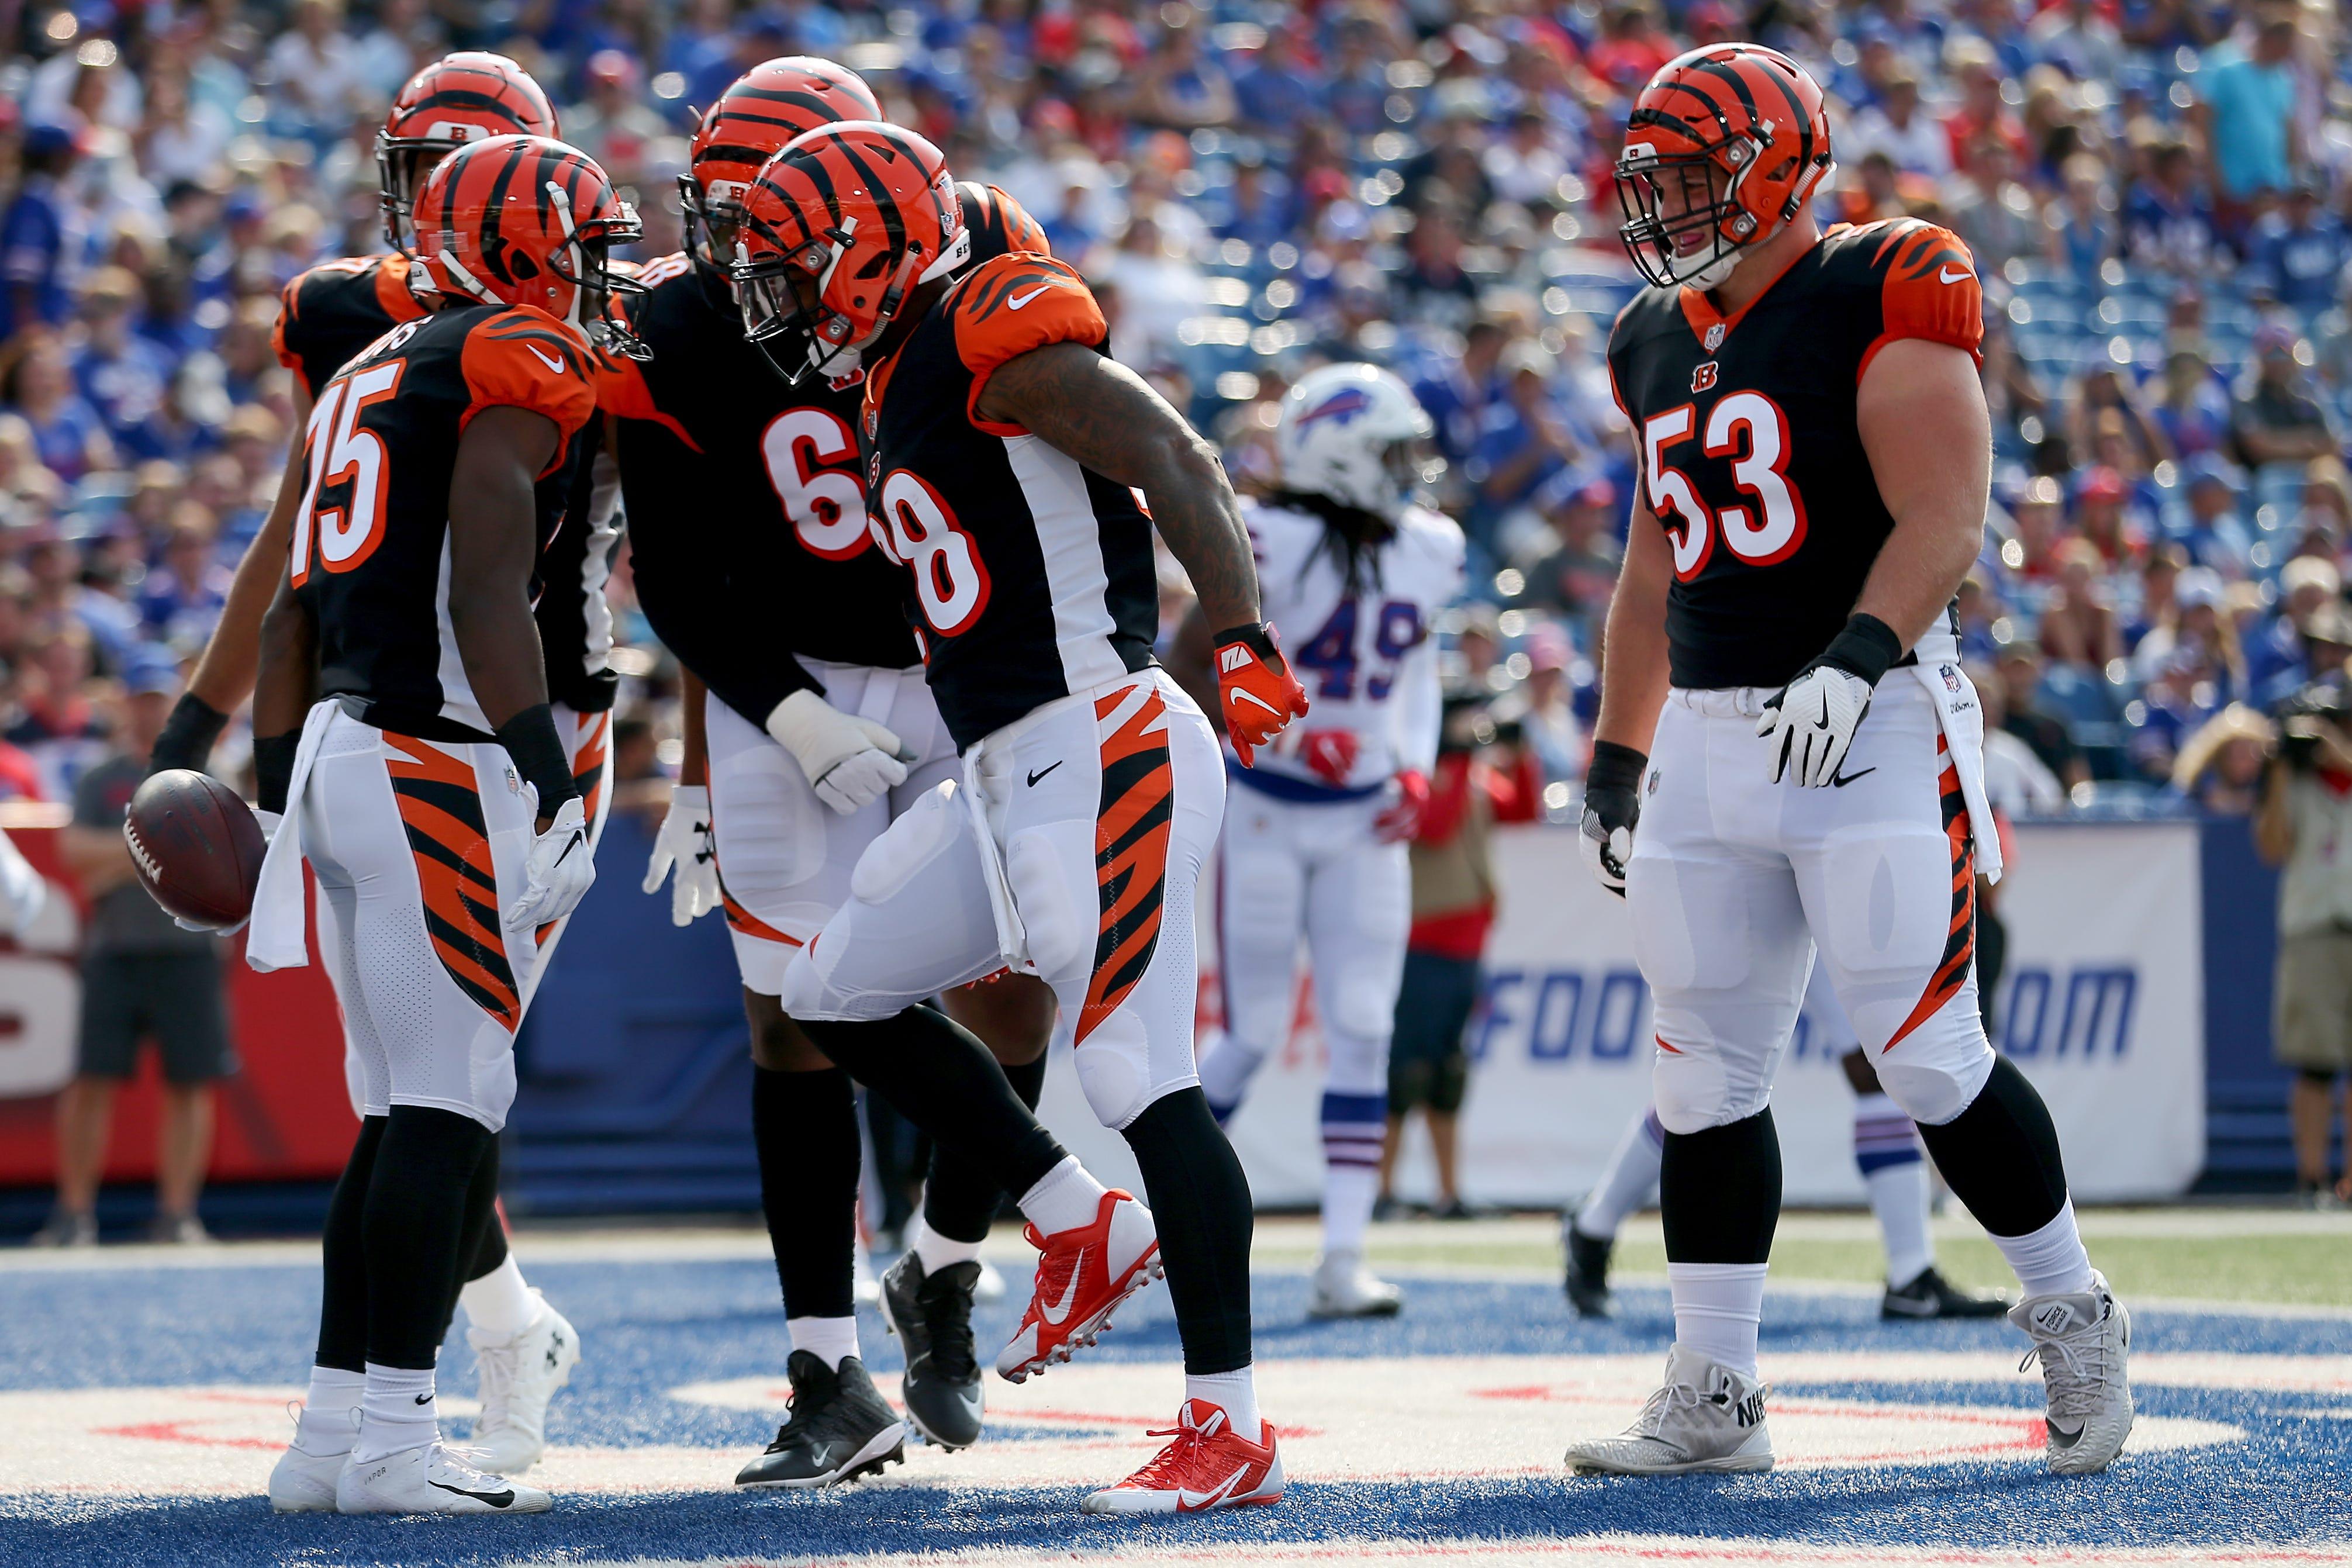 NFL Week 1 Cincinnati Bengals: Young players shining in stripes